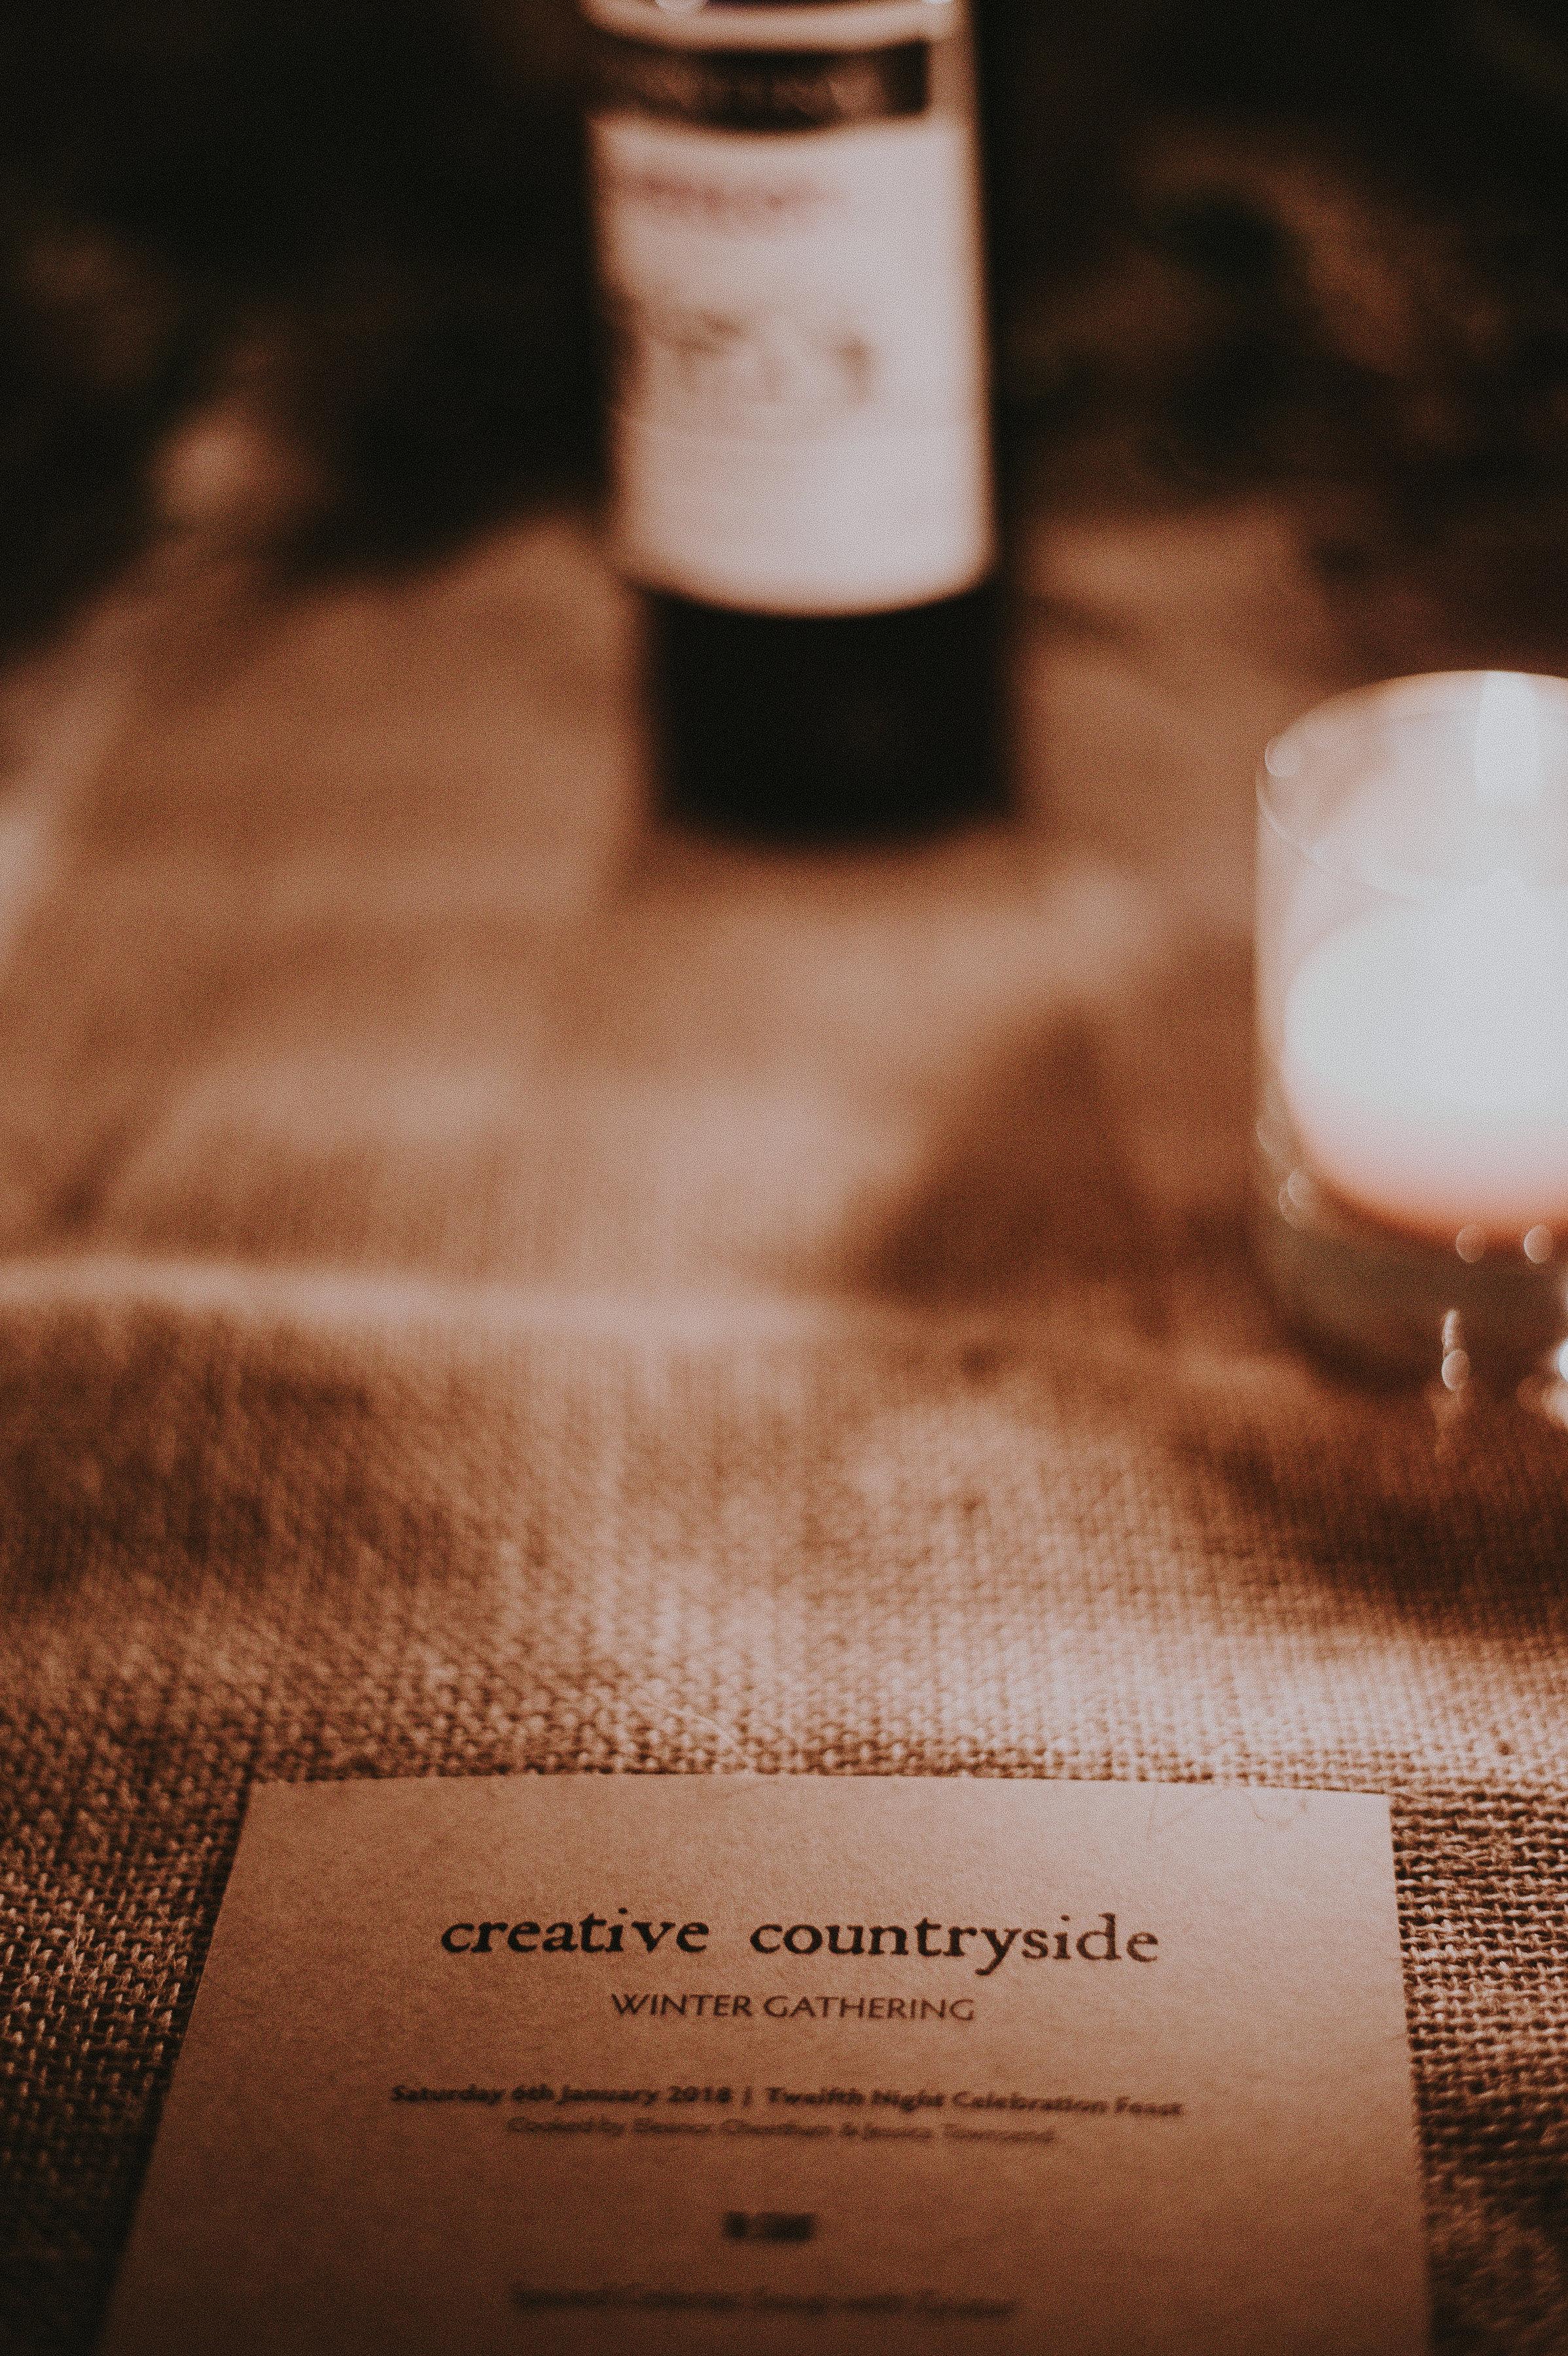 CreativeCountrysideWinterGathering-12-7.jpg